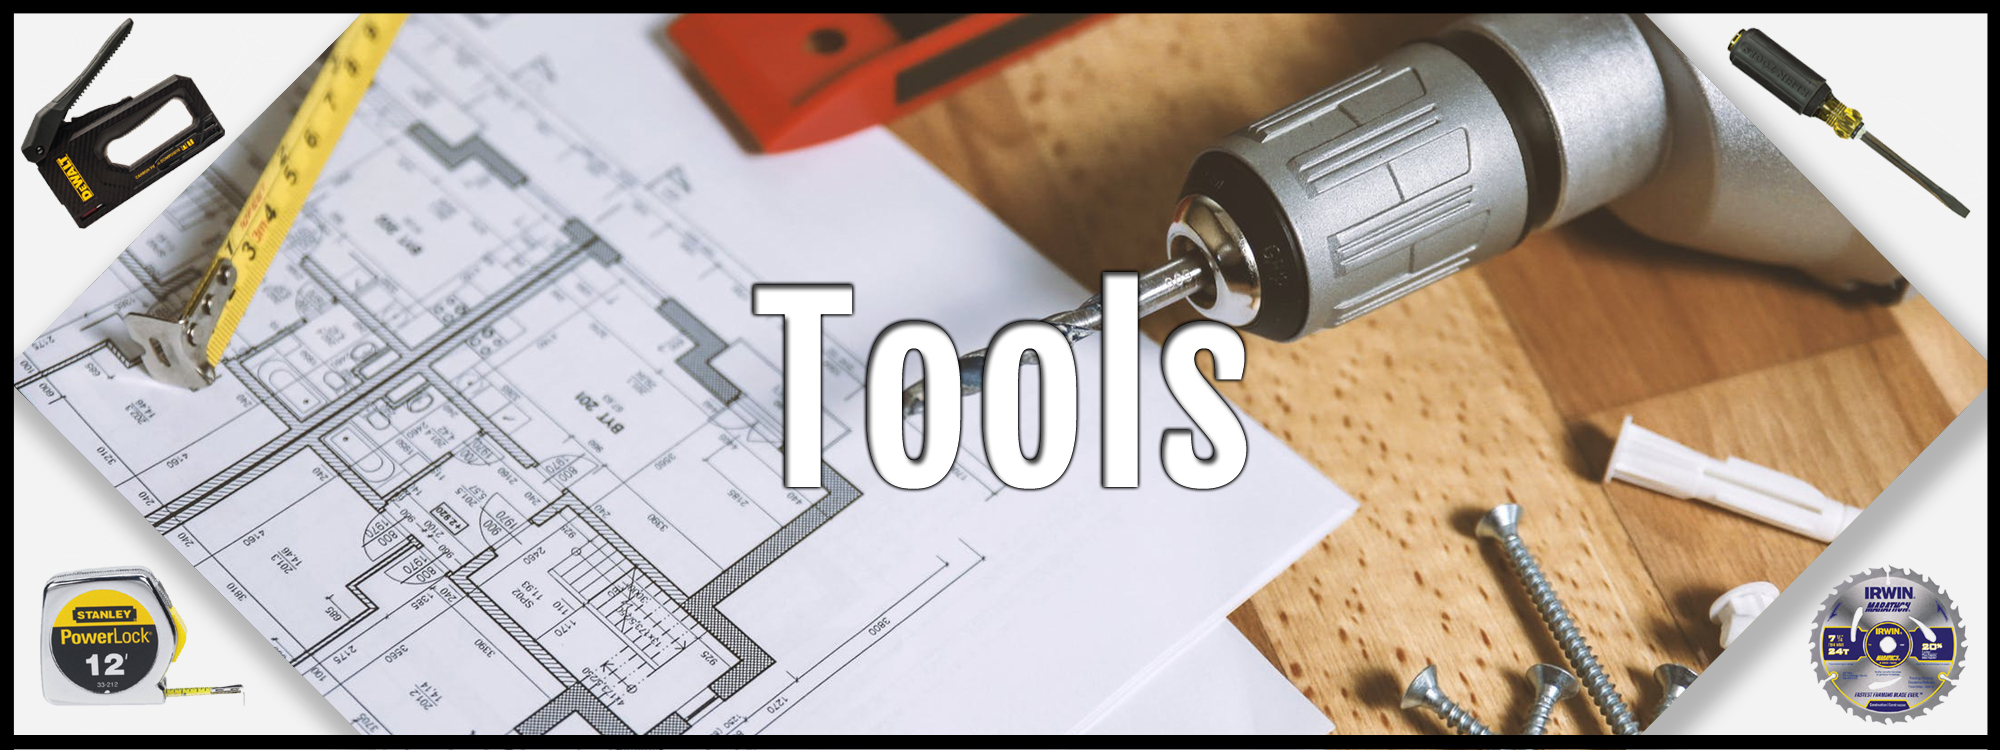 tools banner copy.jpg